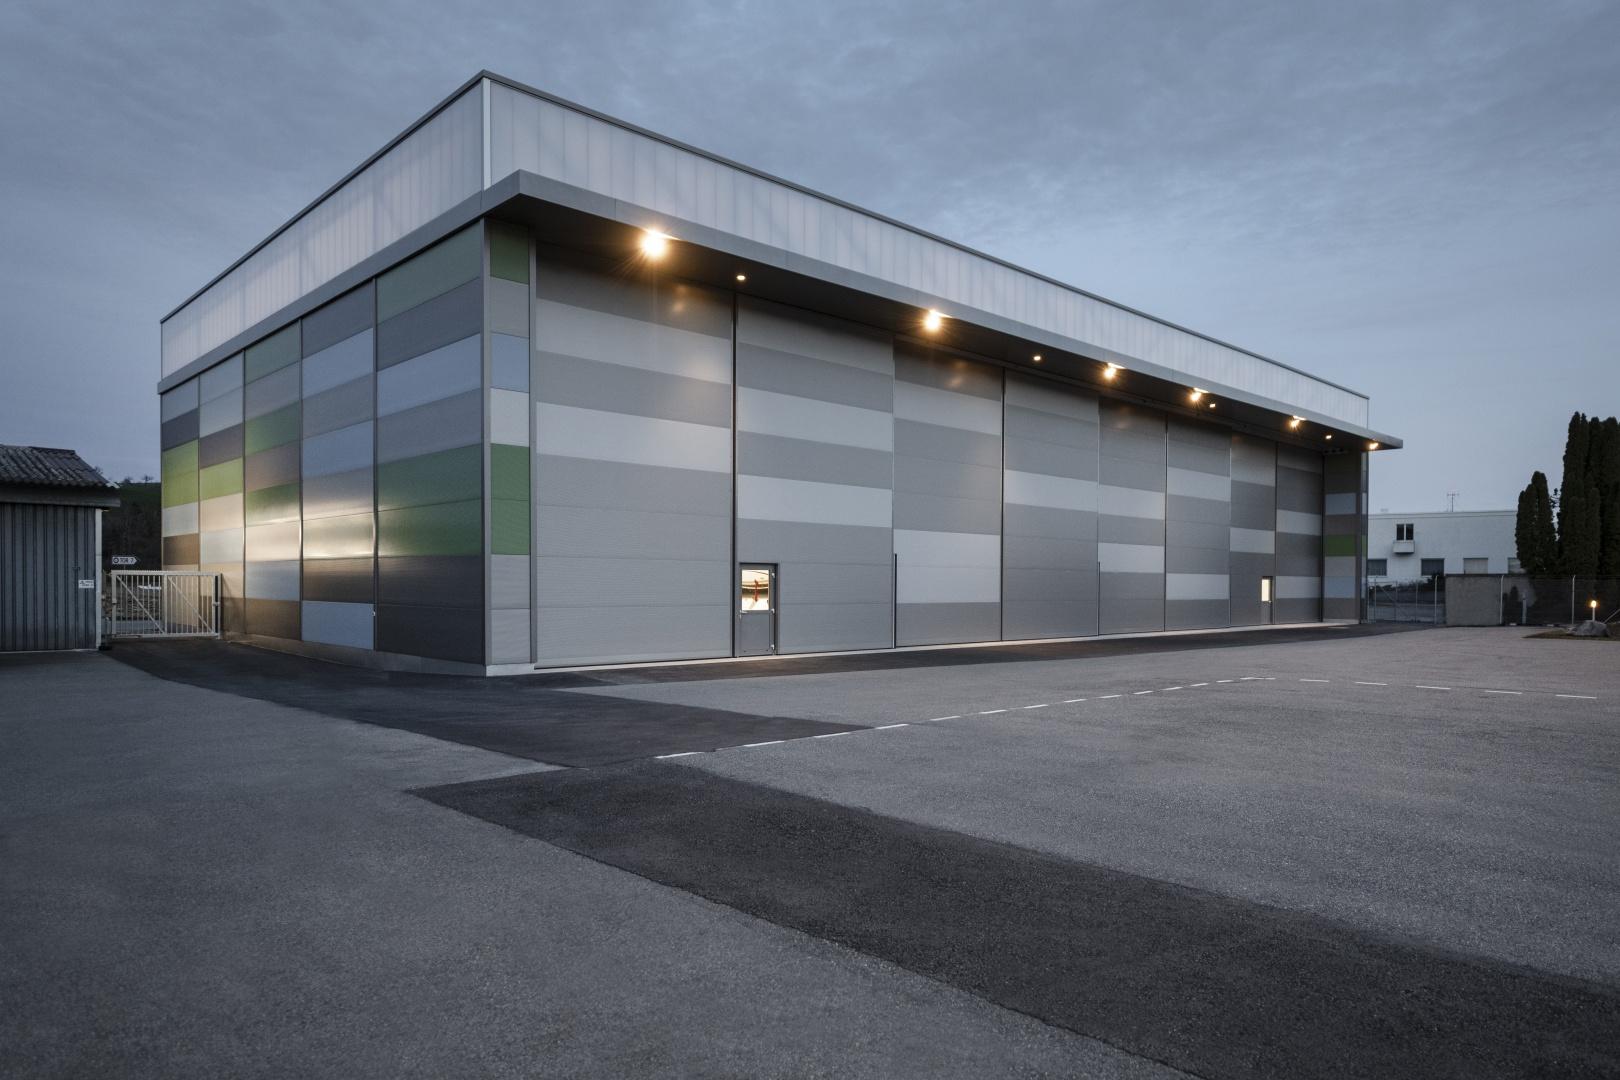 Hangar Aussen Tore geschlossen © Rob Lewis Potography, Wasserwerkgasse 29, 3011 Bern